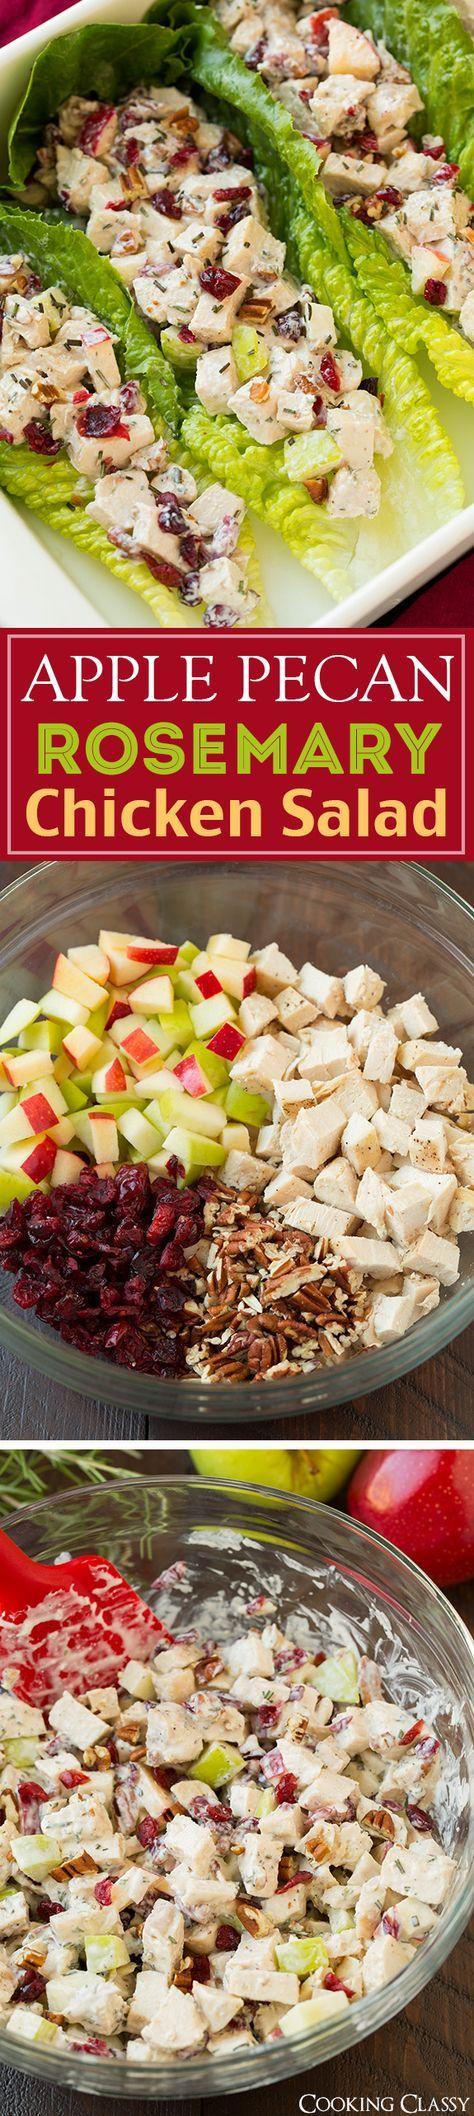 Apple Pecan Rosemary Greek Yogurt Chicken Salad - perfect in a sandwich or wrapped in lettuce